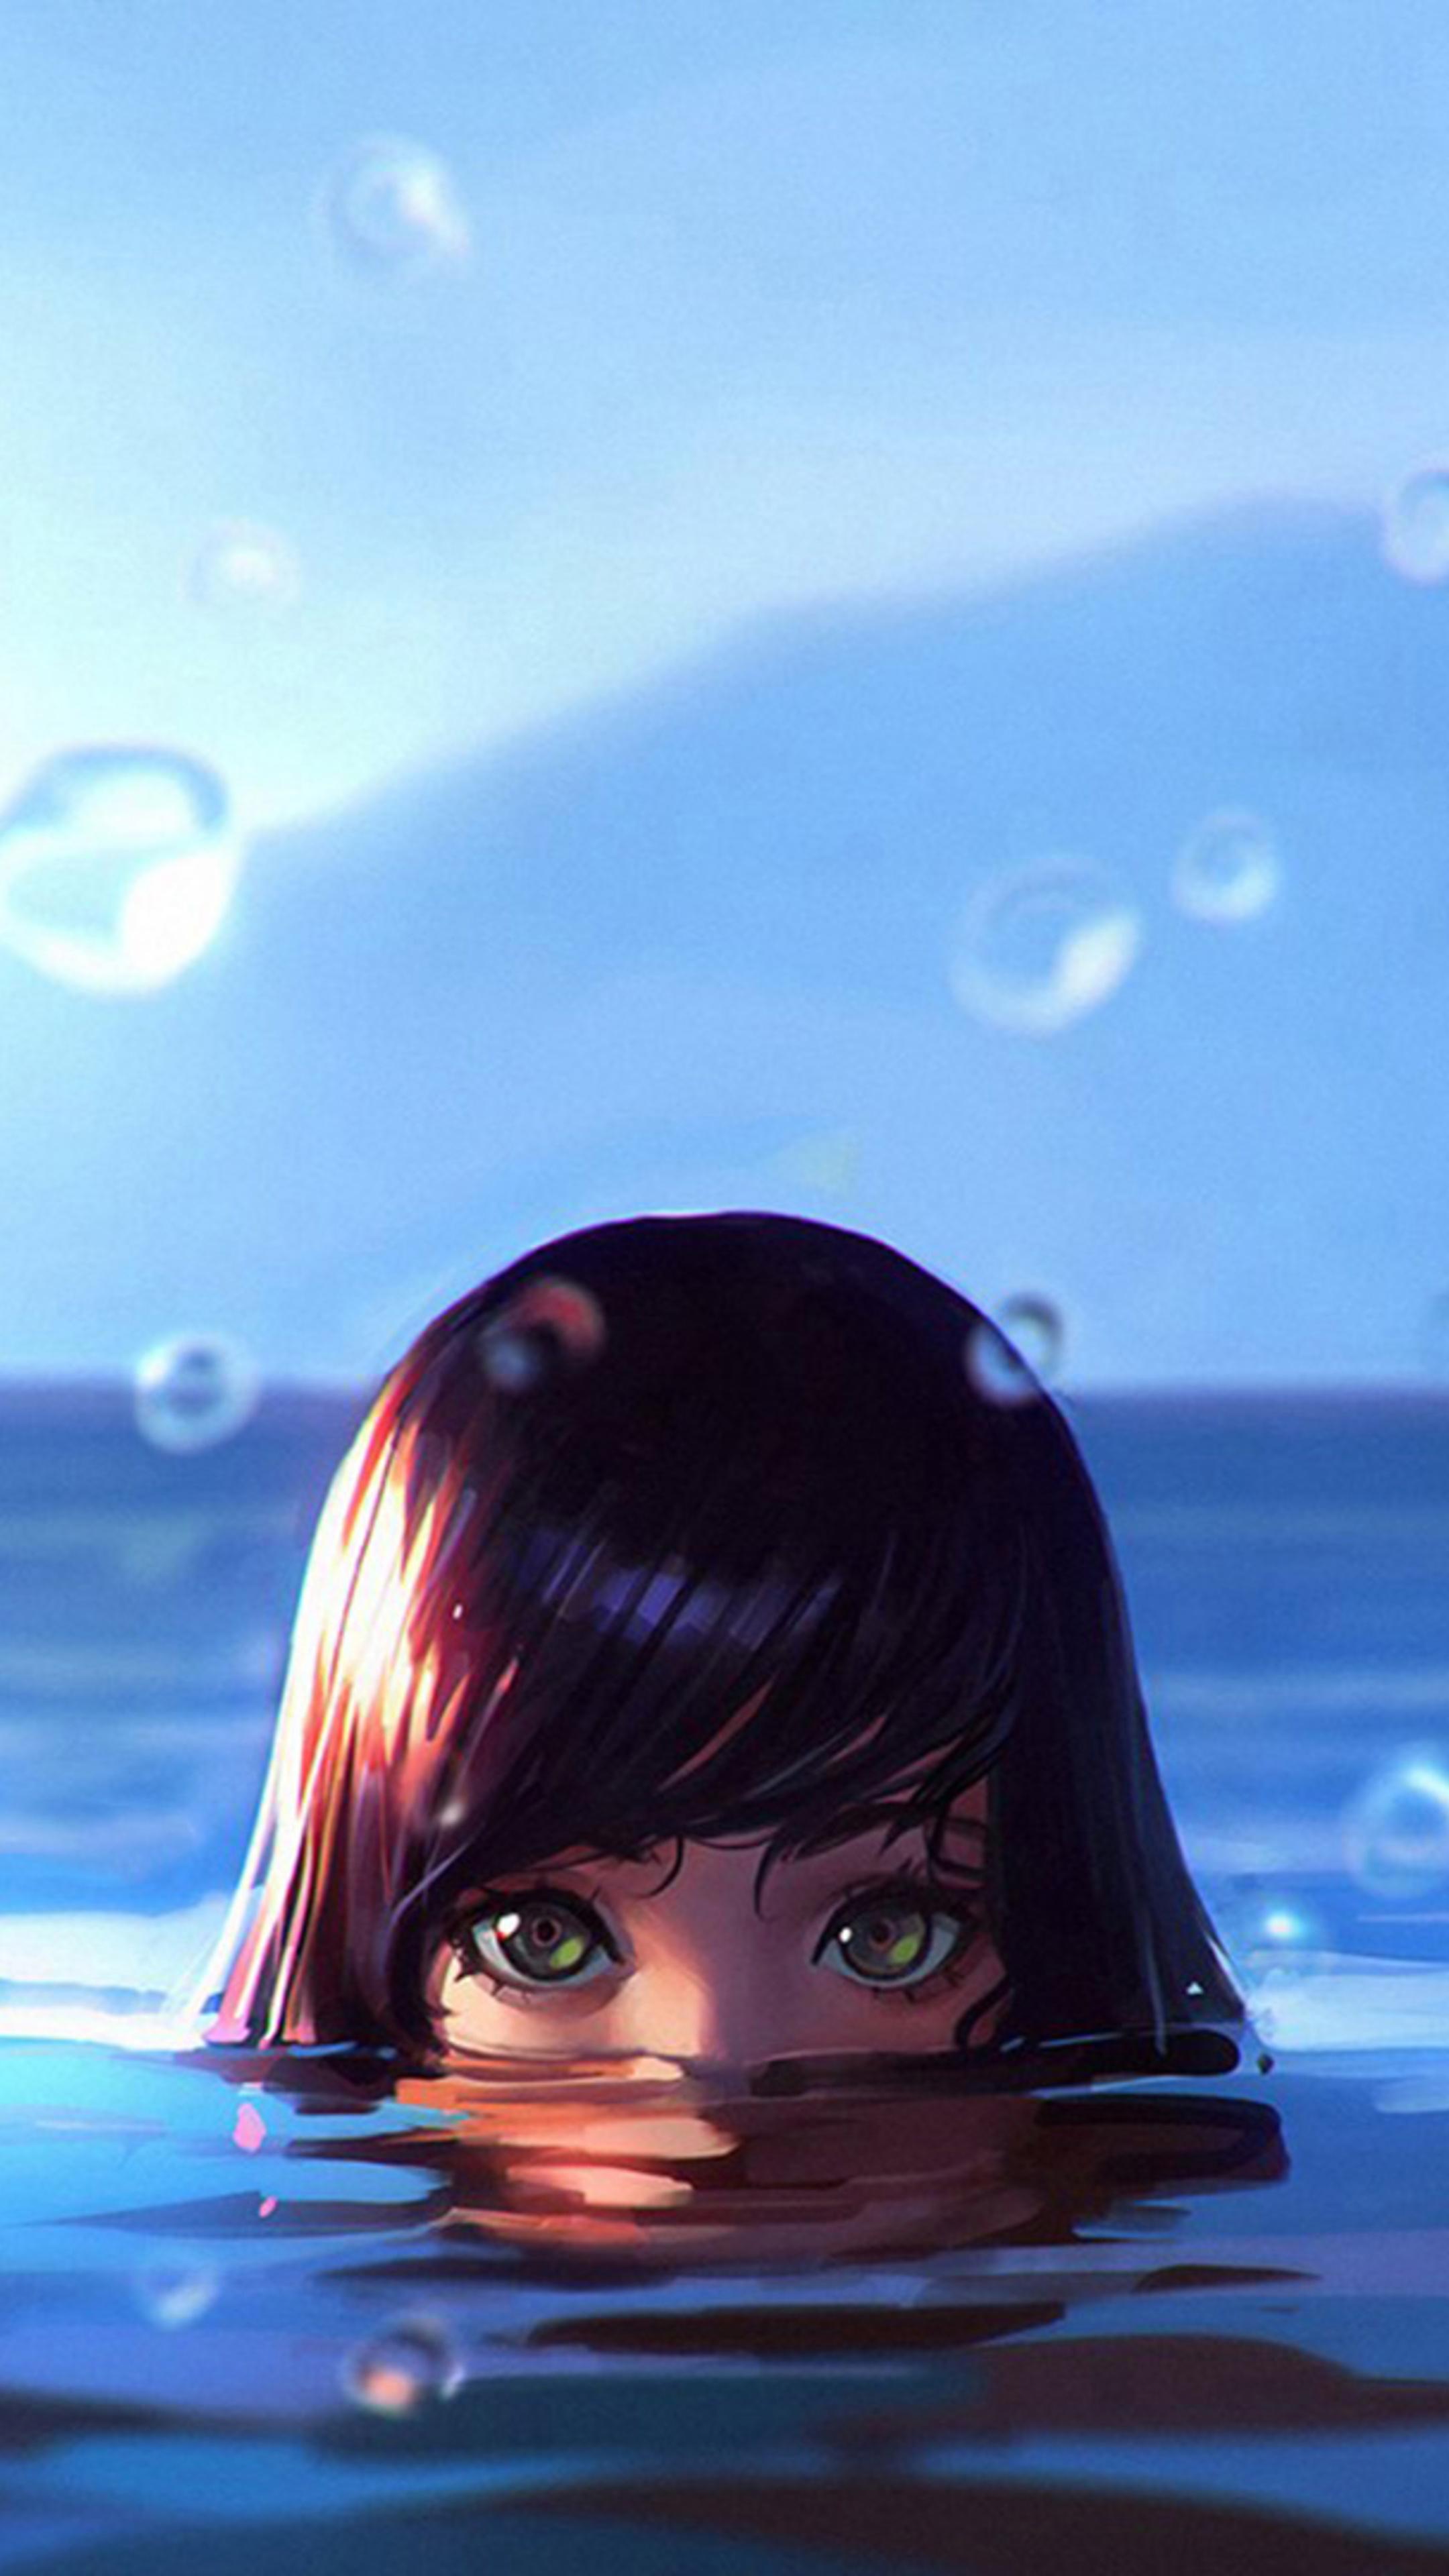 2160x3840 women water drops green eyes wet sony xperia x - Art wallpaper 2160x3840 ...